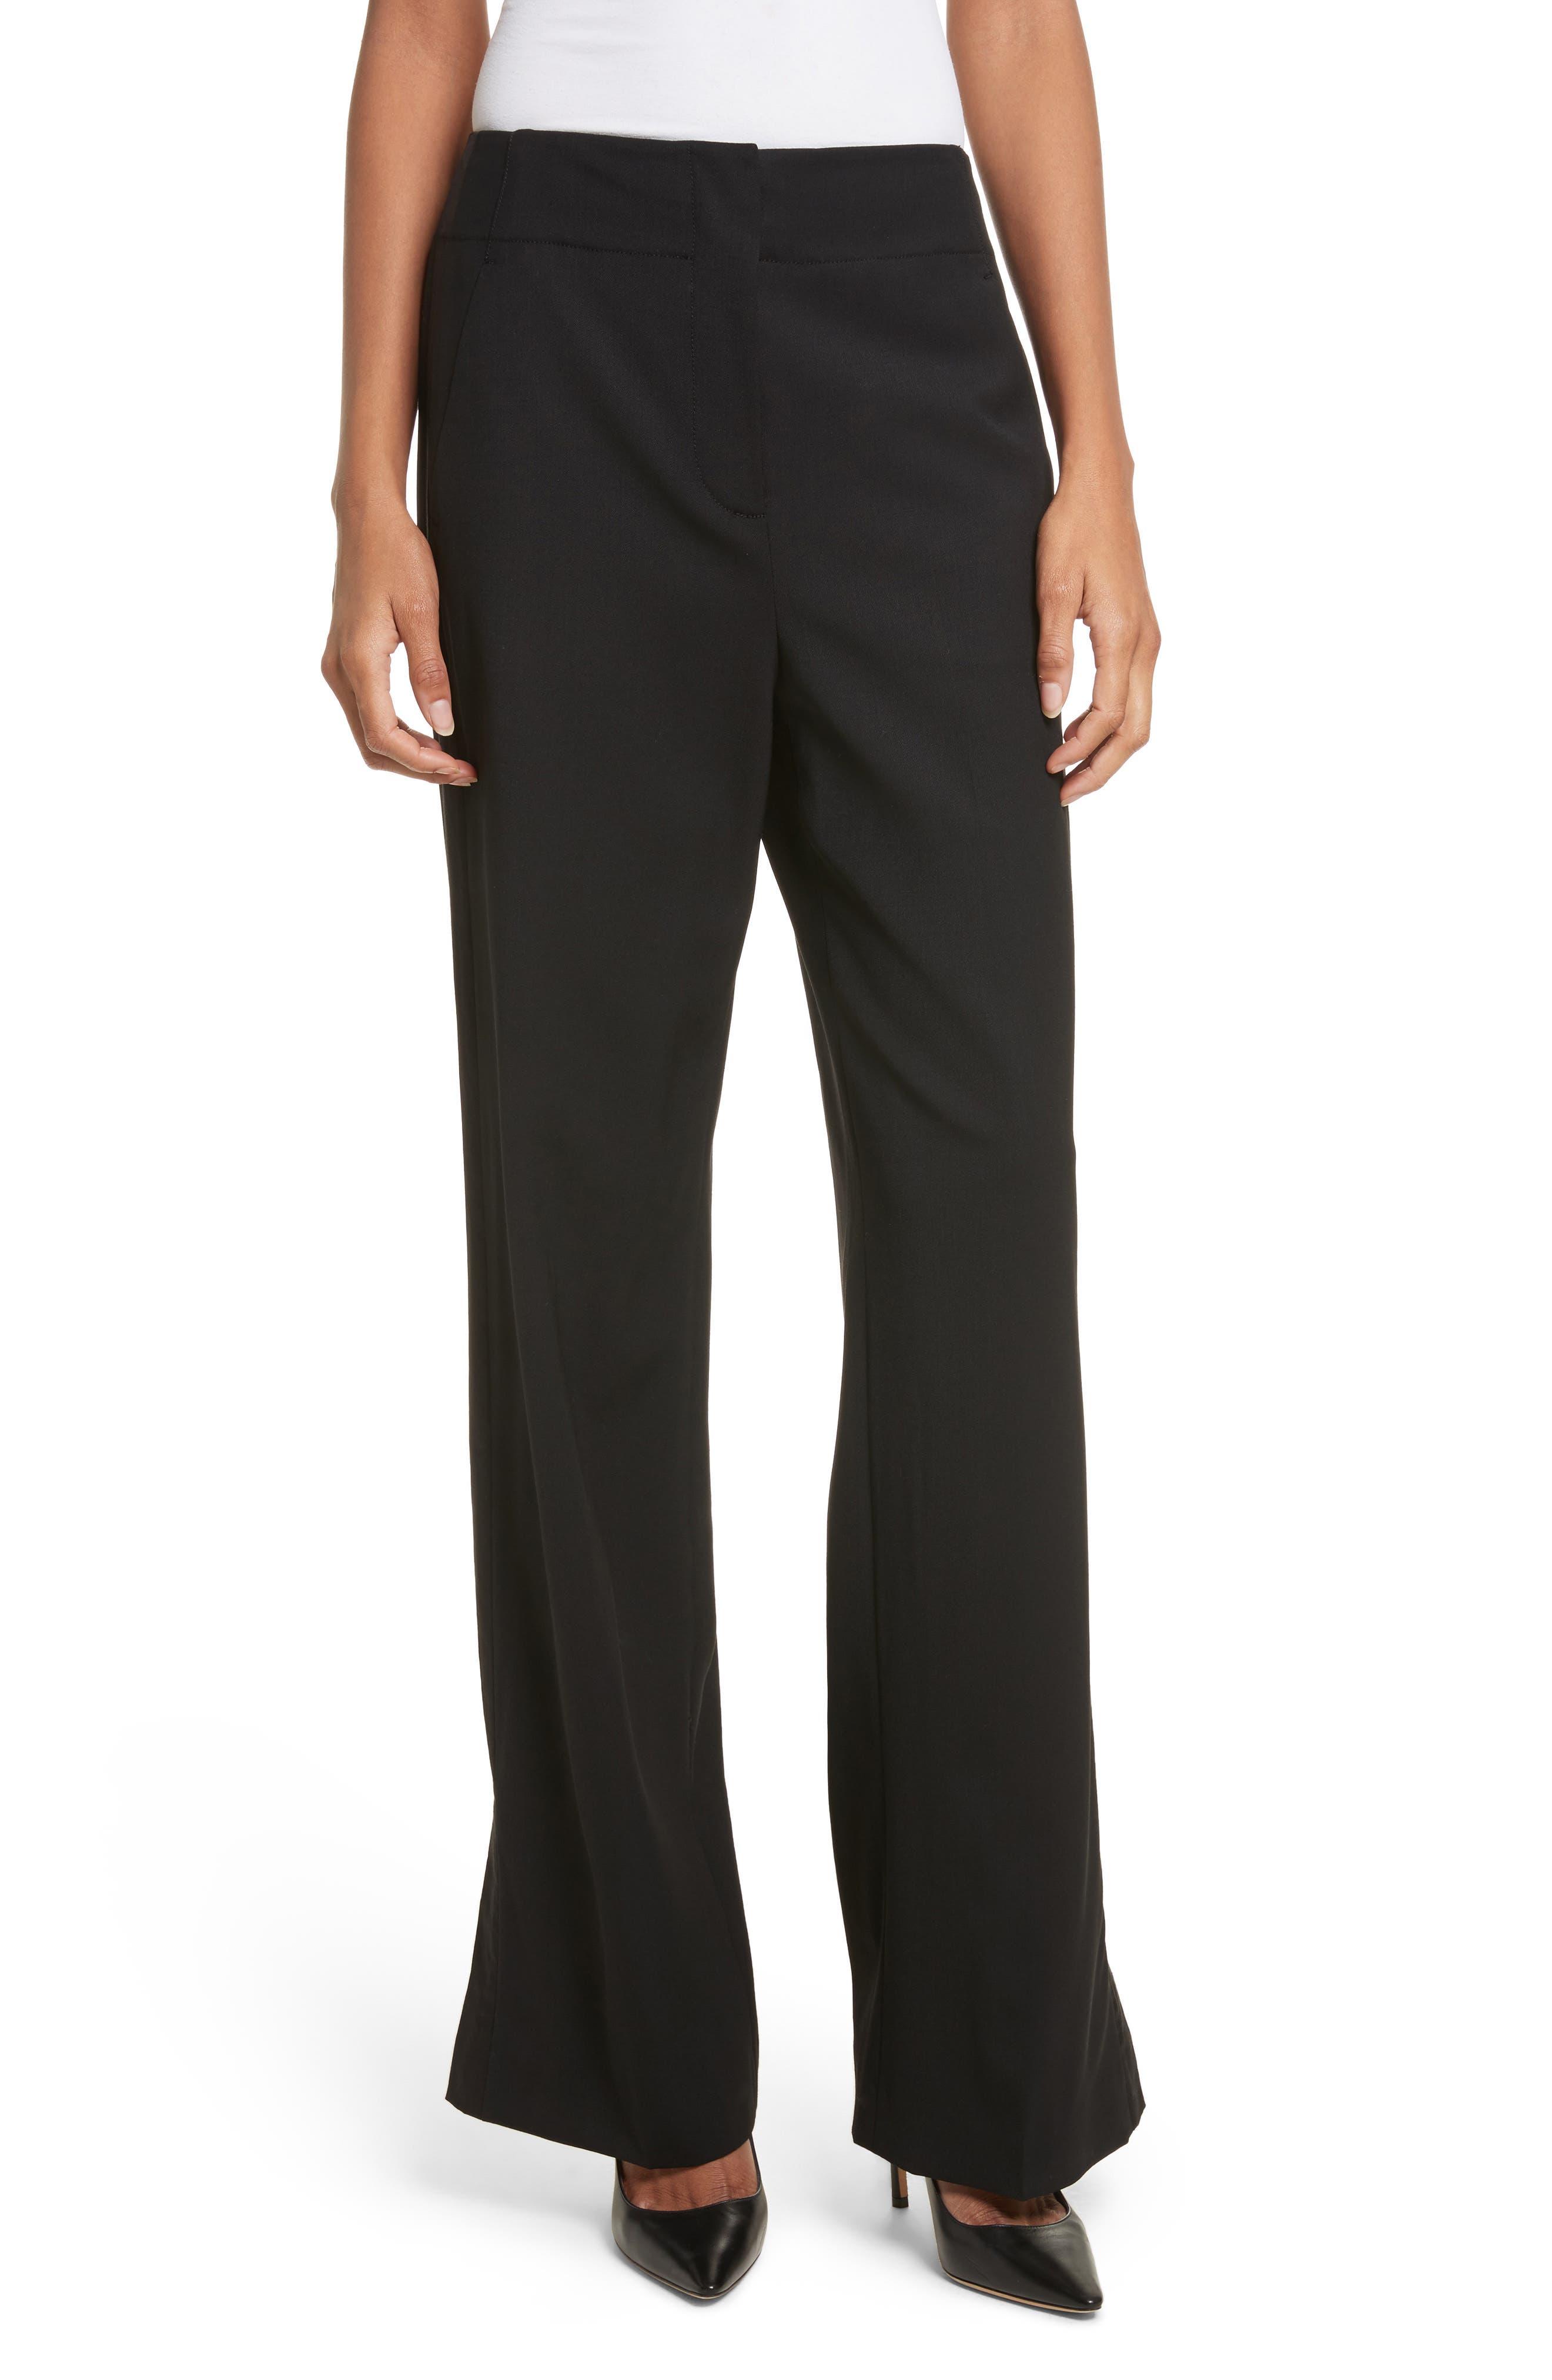 Alternate Image 1 Selected - Rebecca Stretch Wool Tuxedo Pants